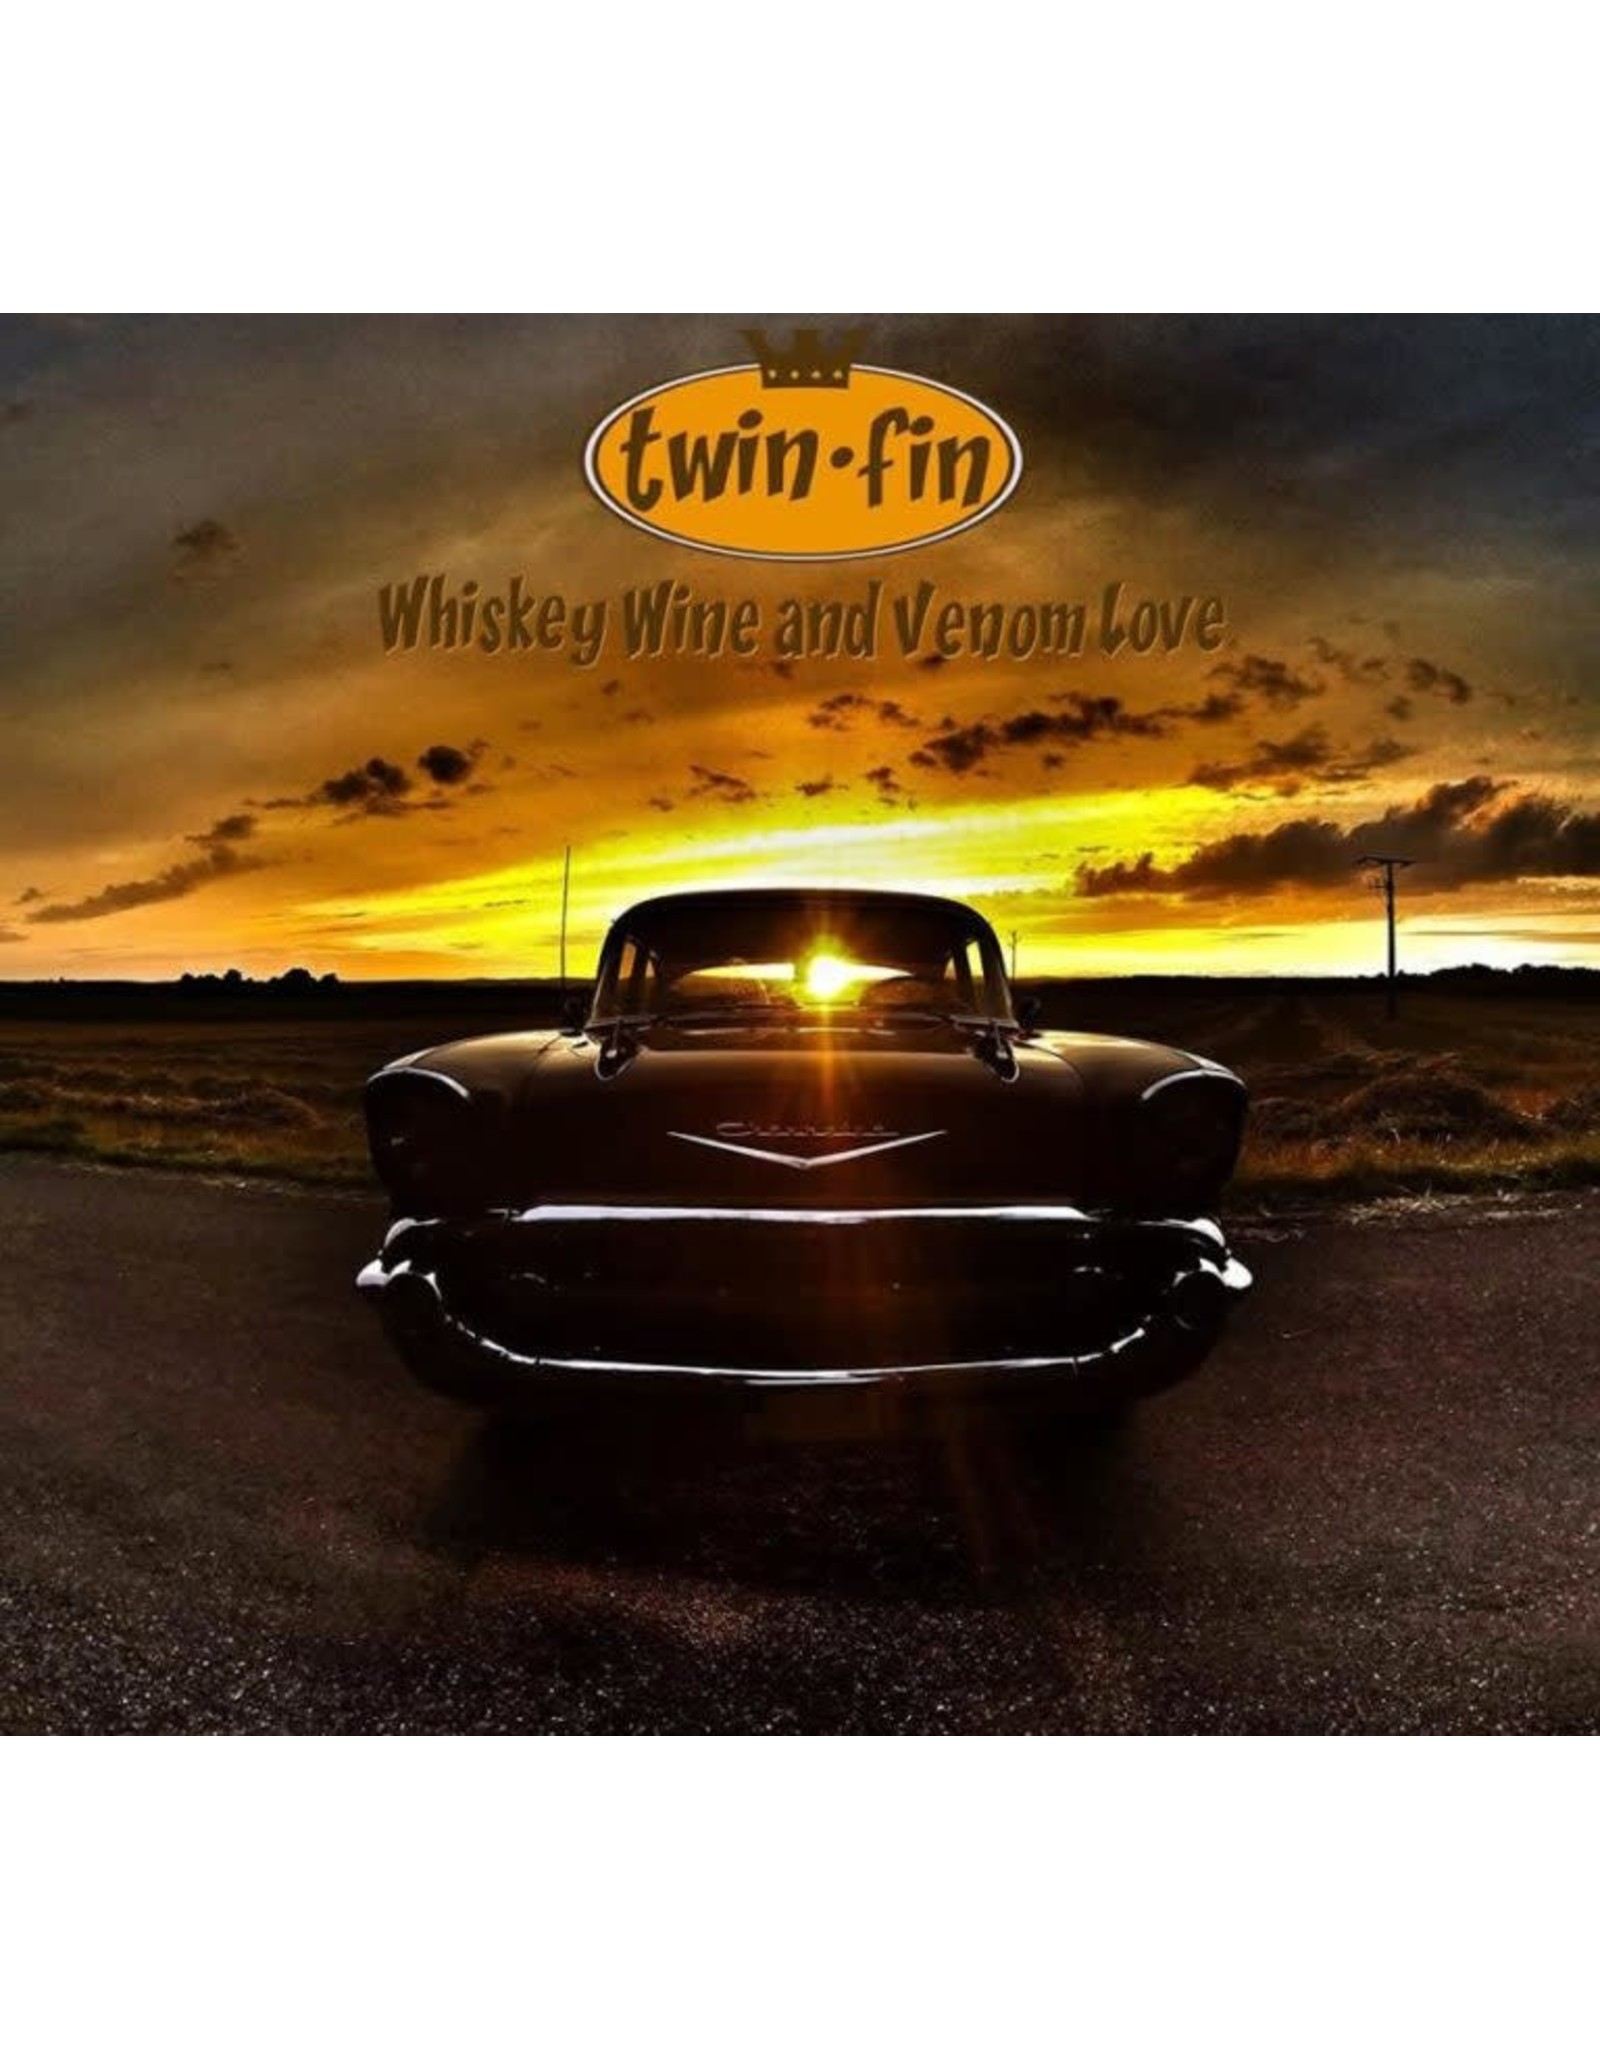 Twin Fin - Whiskey, Wine and Venom Love LP